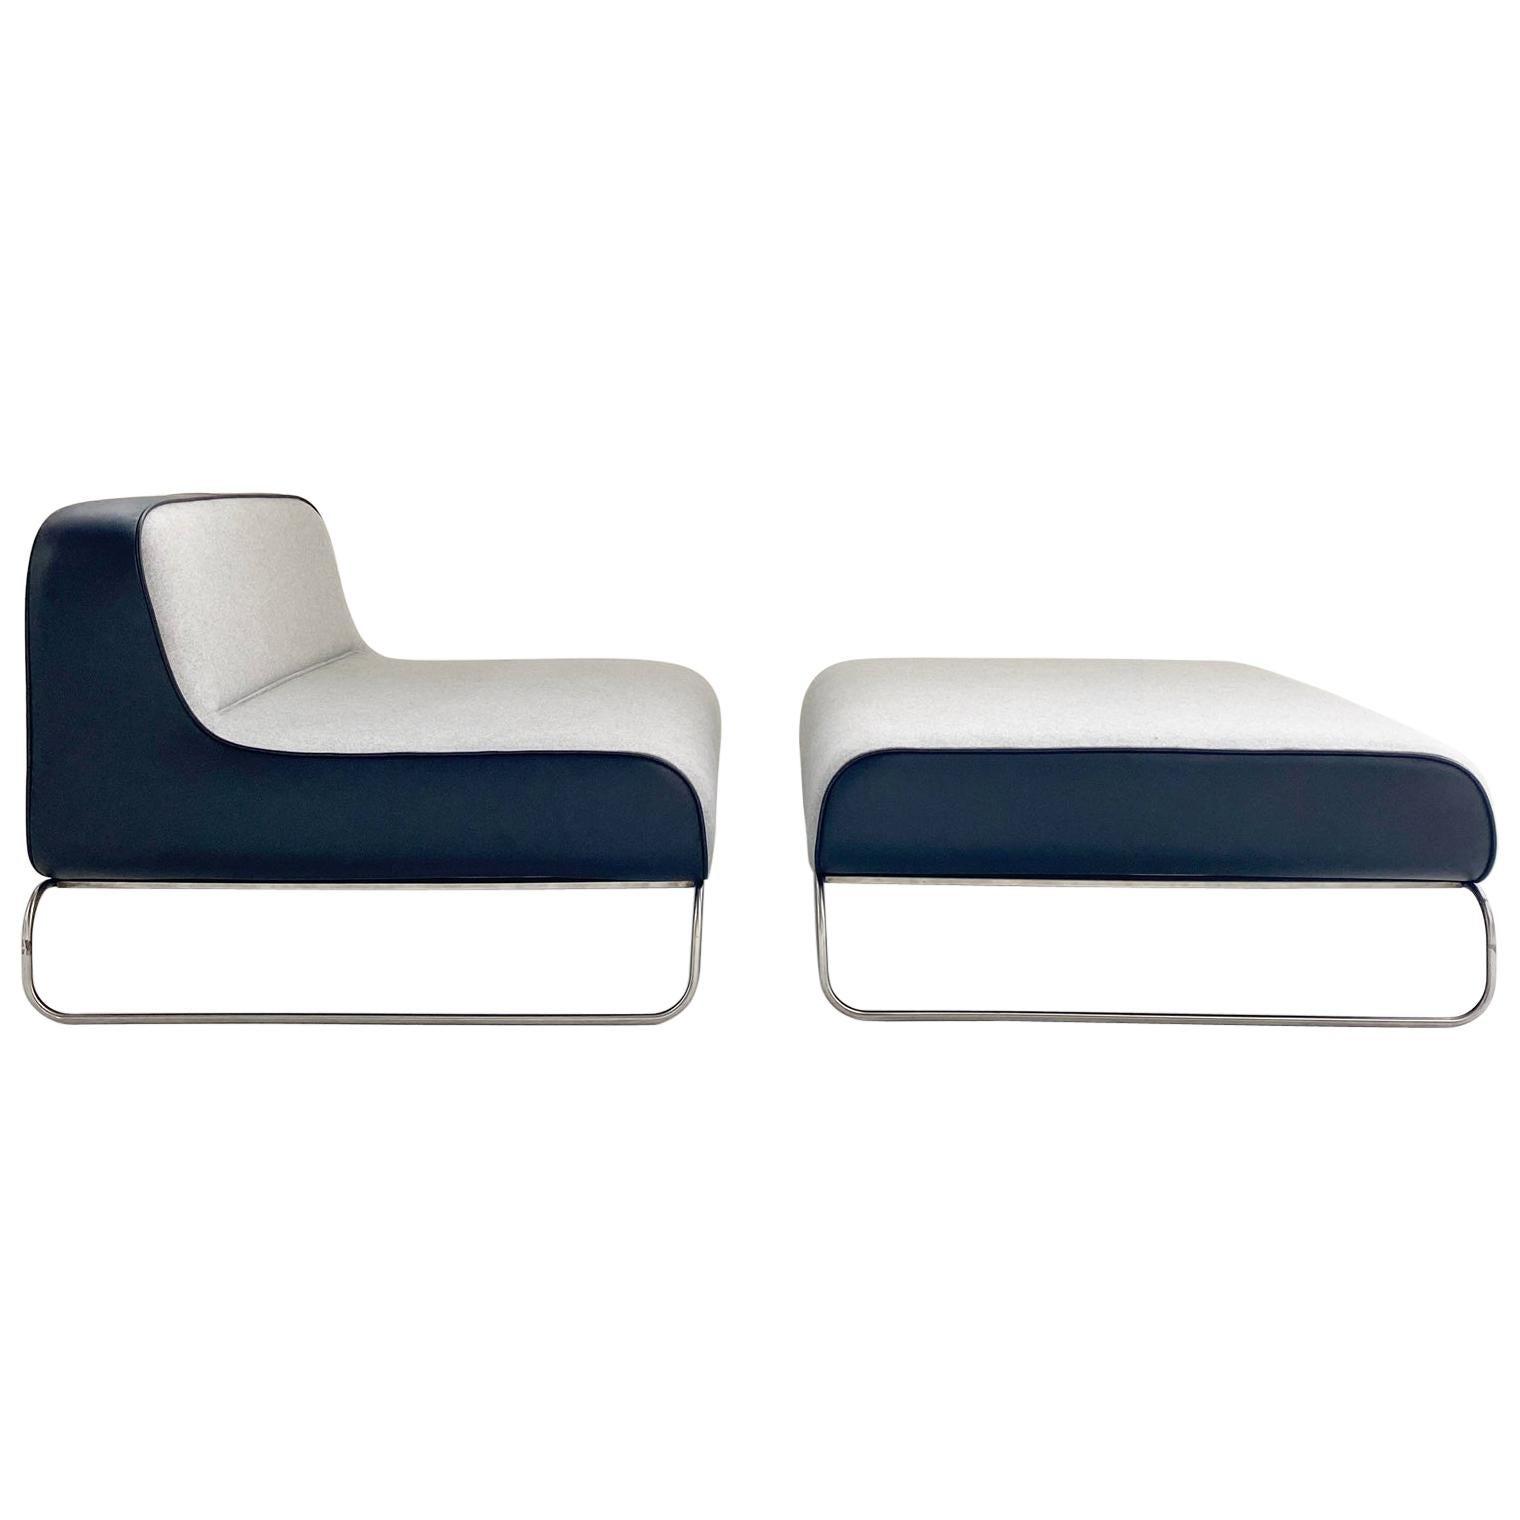 Piero Lissoni Lounge Chair & Ottoman in Loro Piana Cashmere and Leather